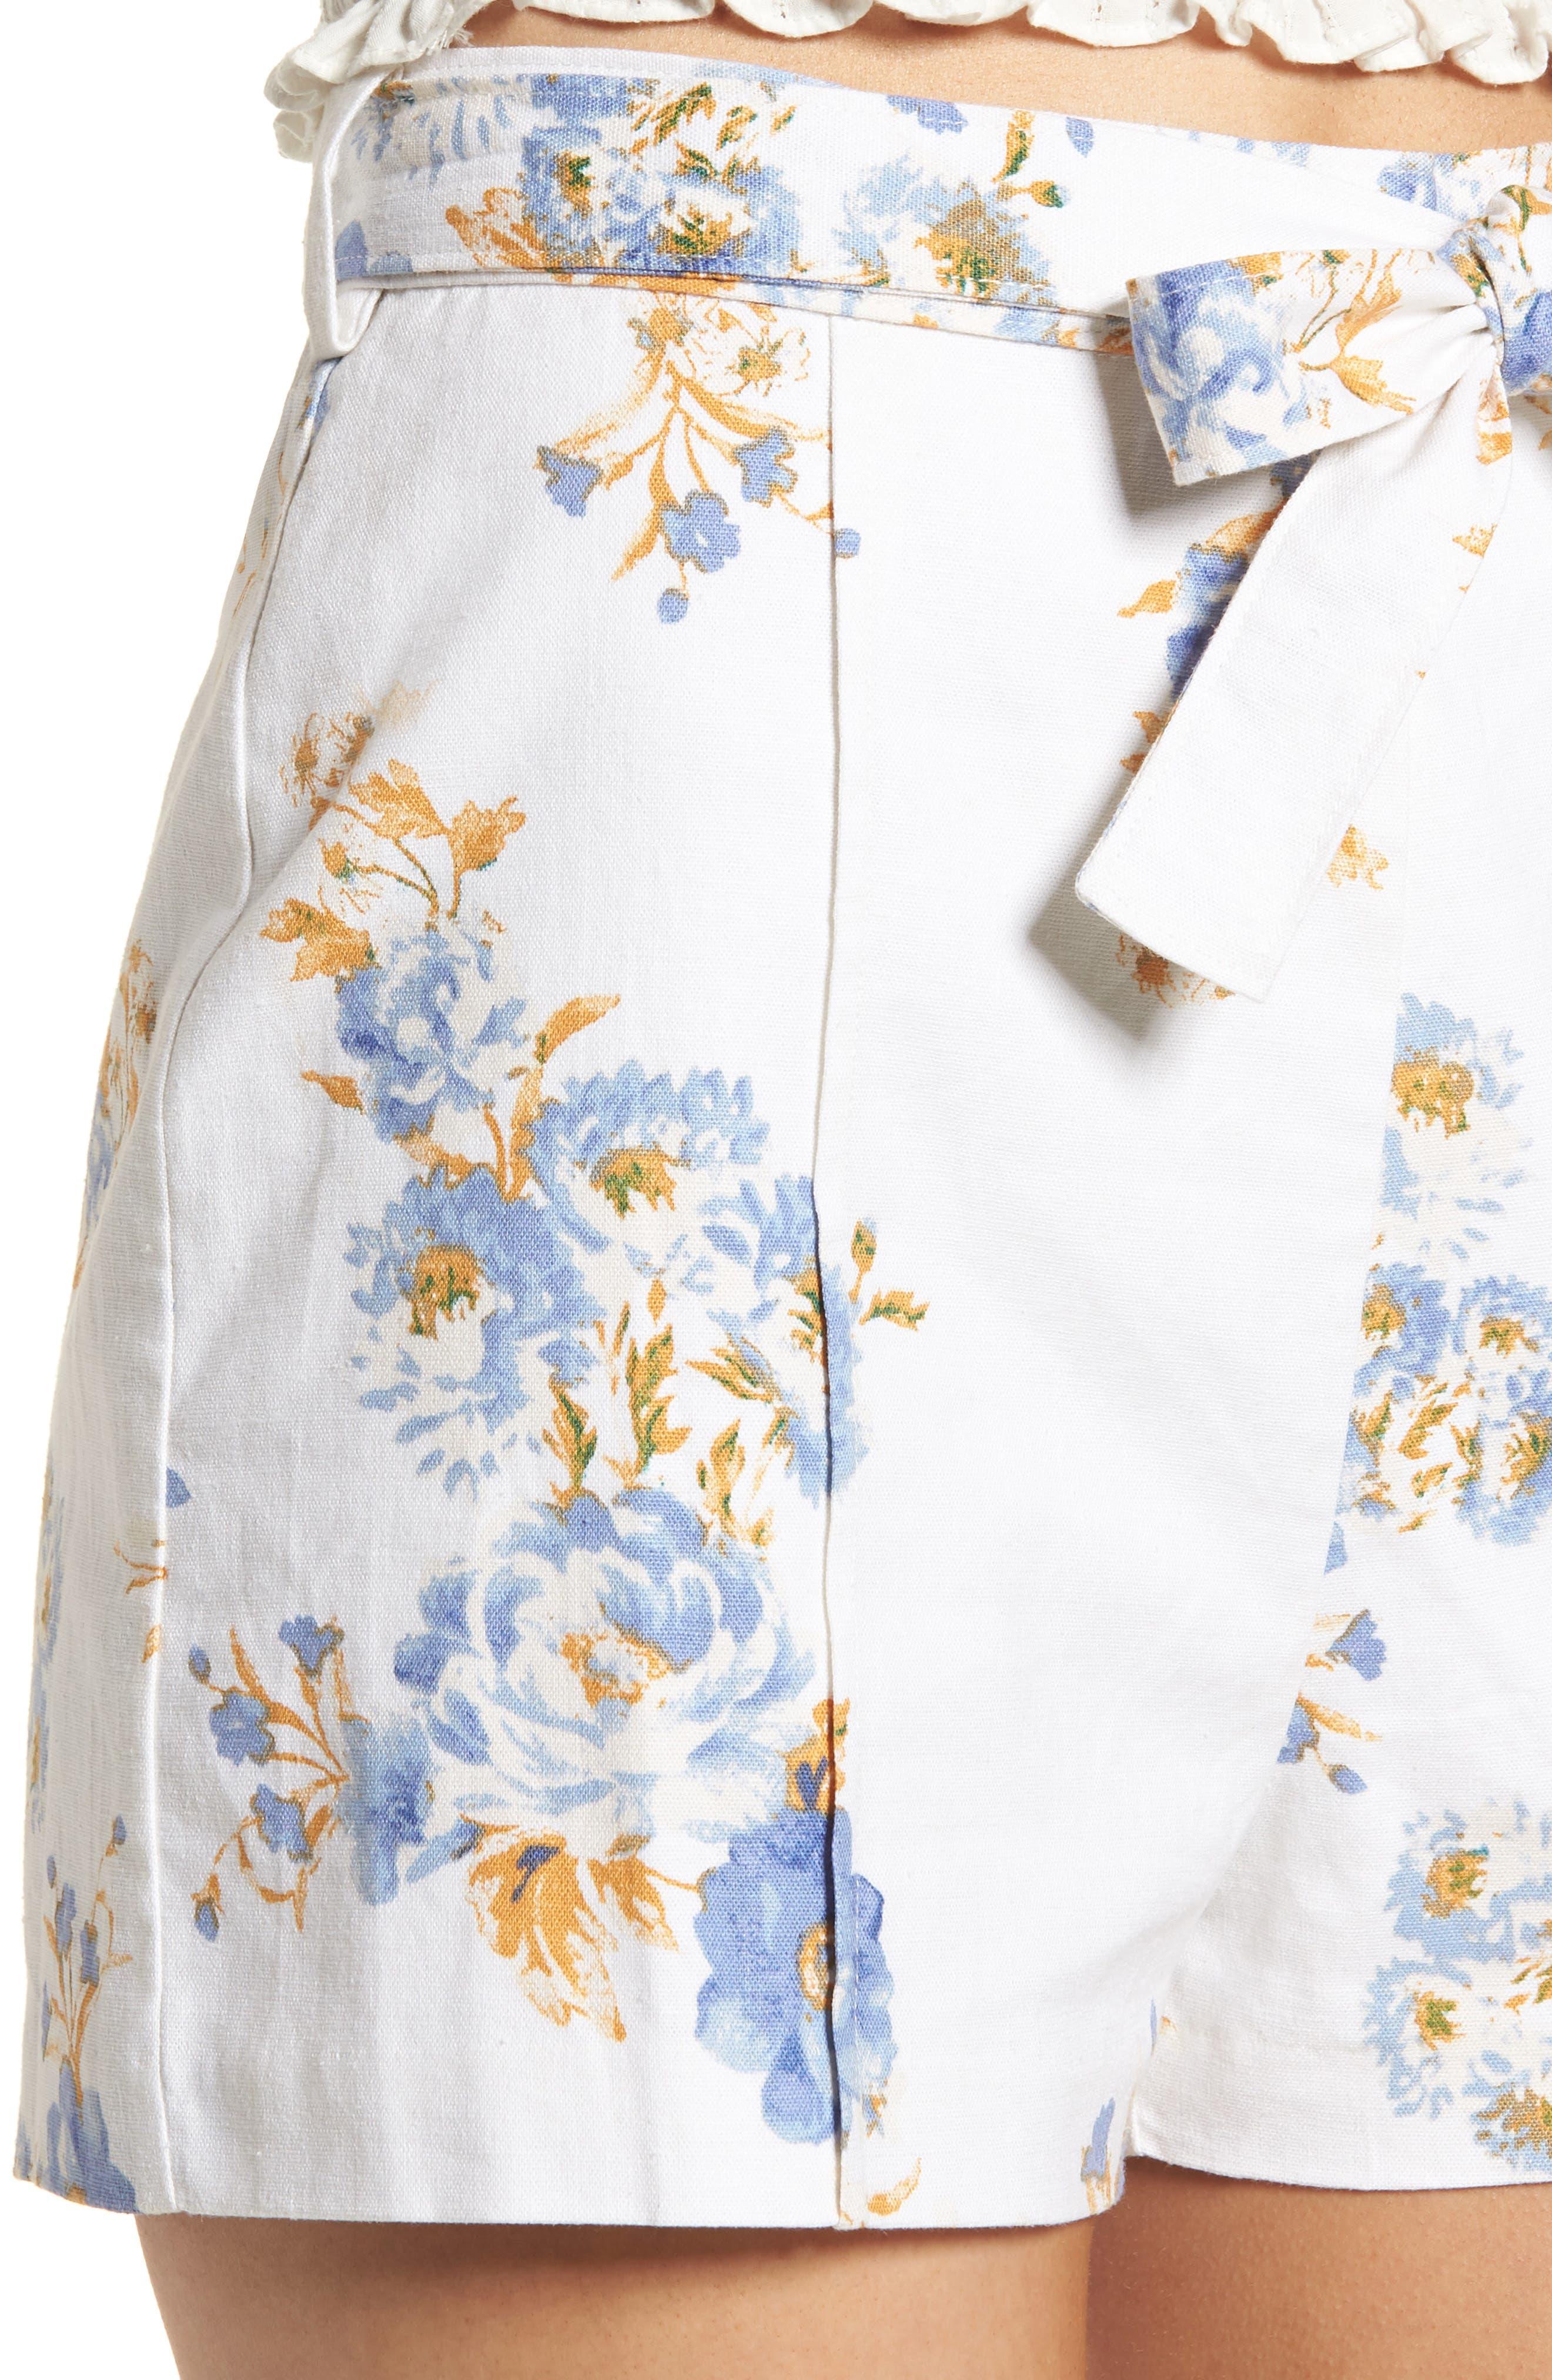 Matera High Waist Shorts,                             Alternate thumbnail 4, color,                             Ivory Floral